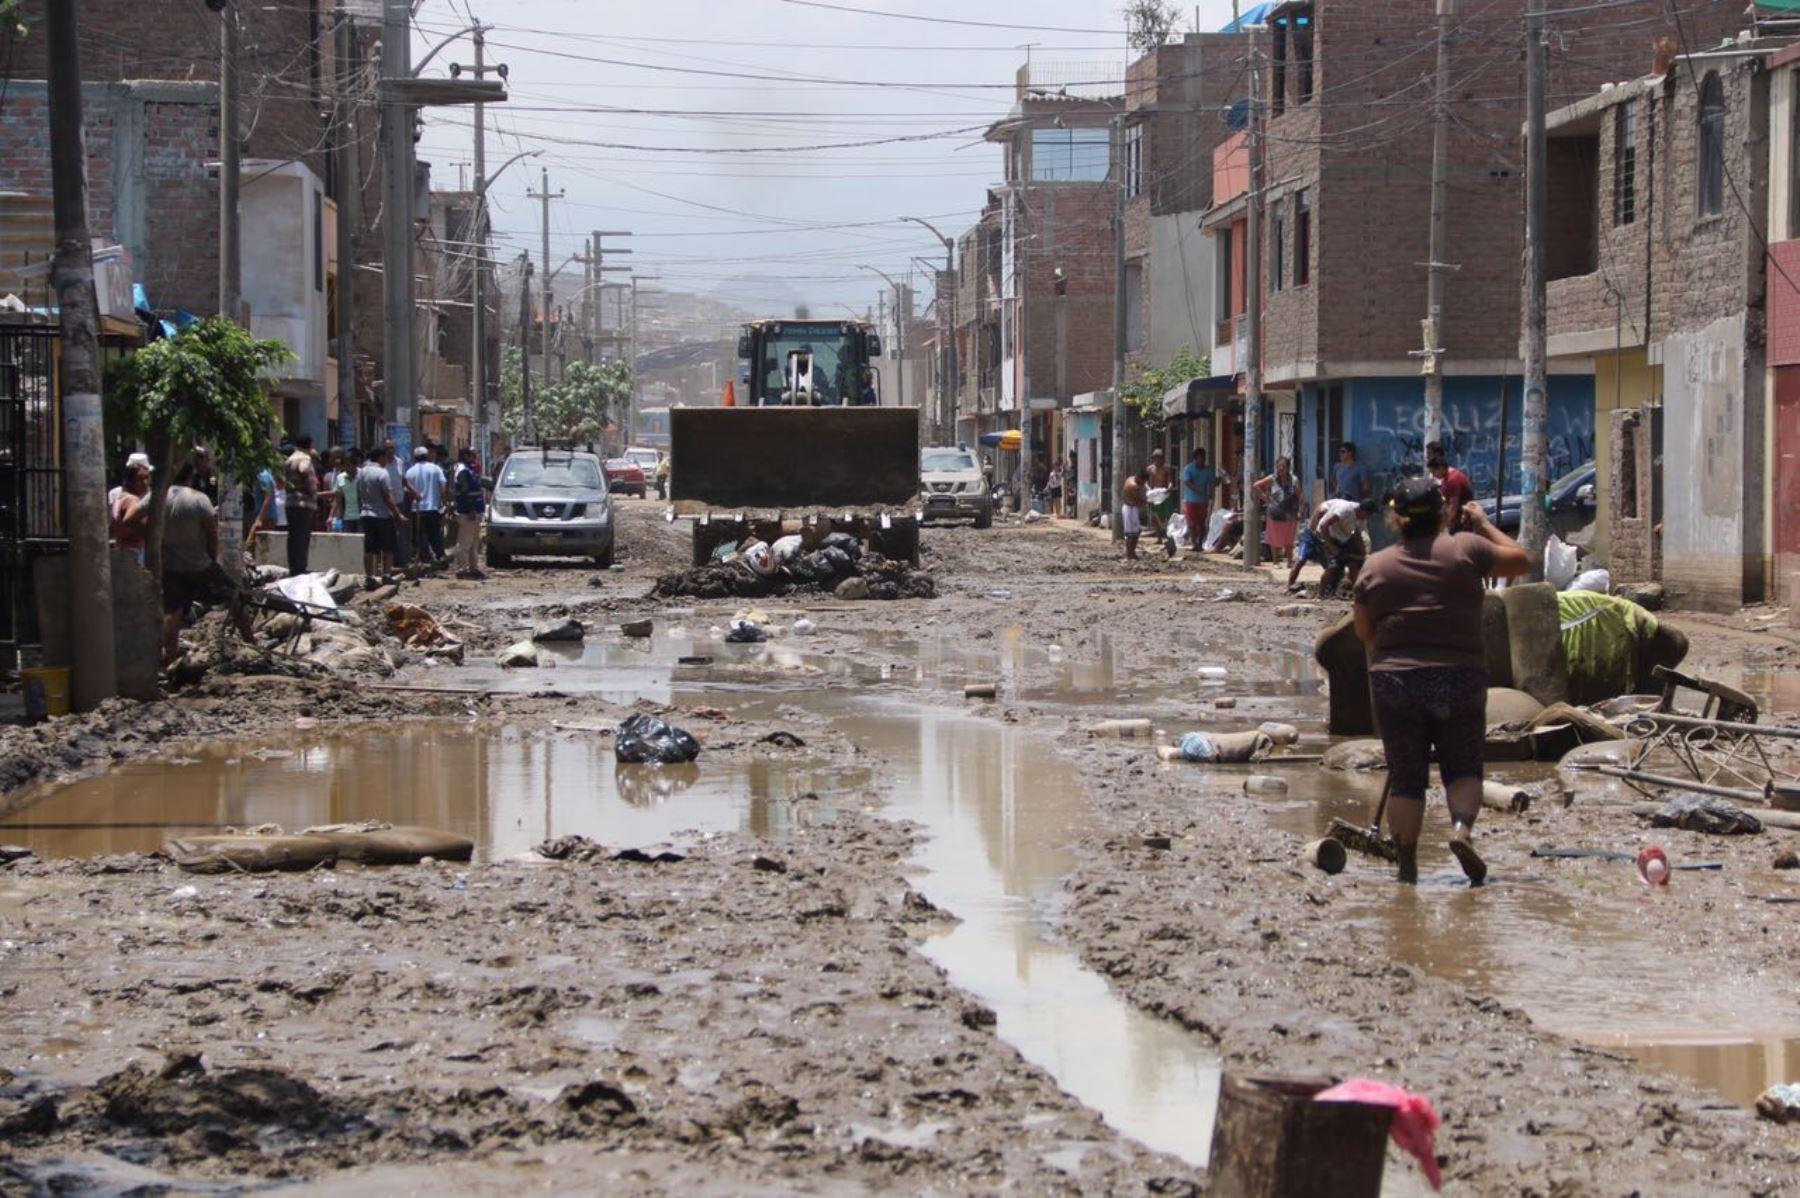 Distrito de El Porvenir en Trujillo, que alberga a Mypes productoras de zapatos, fue afectado severamente por huaicos, ANDINA